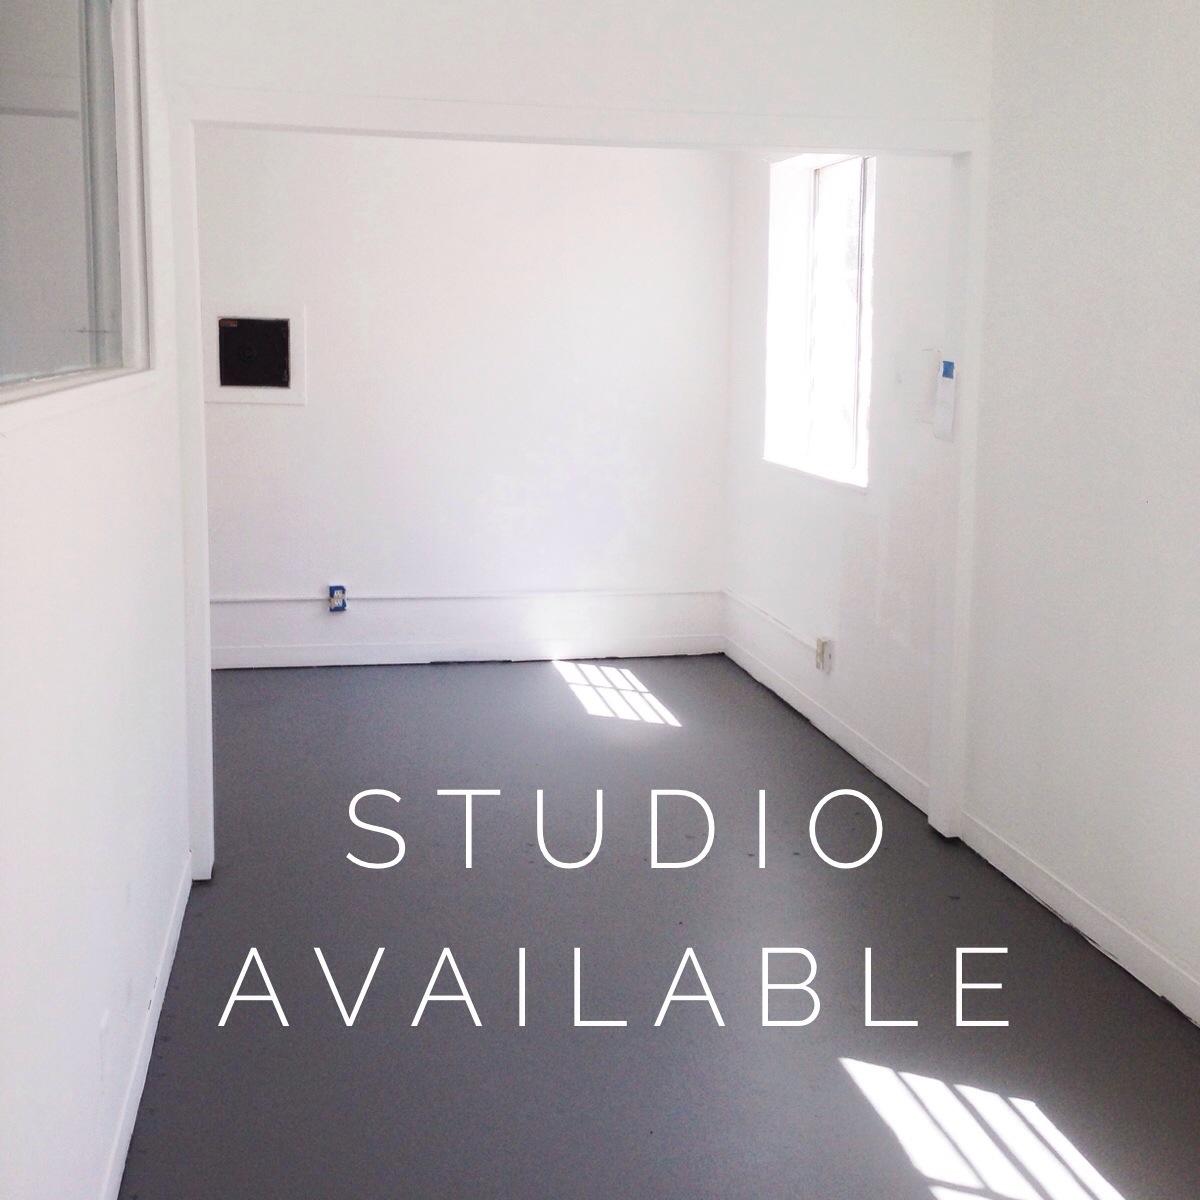 Studio Openings